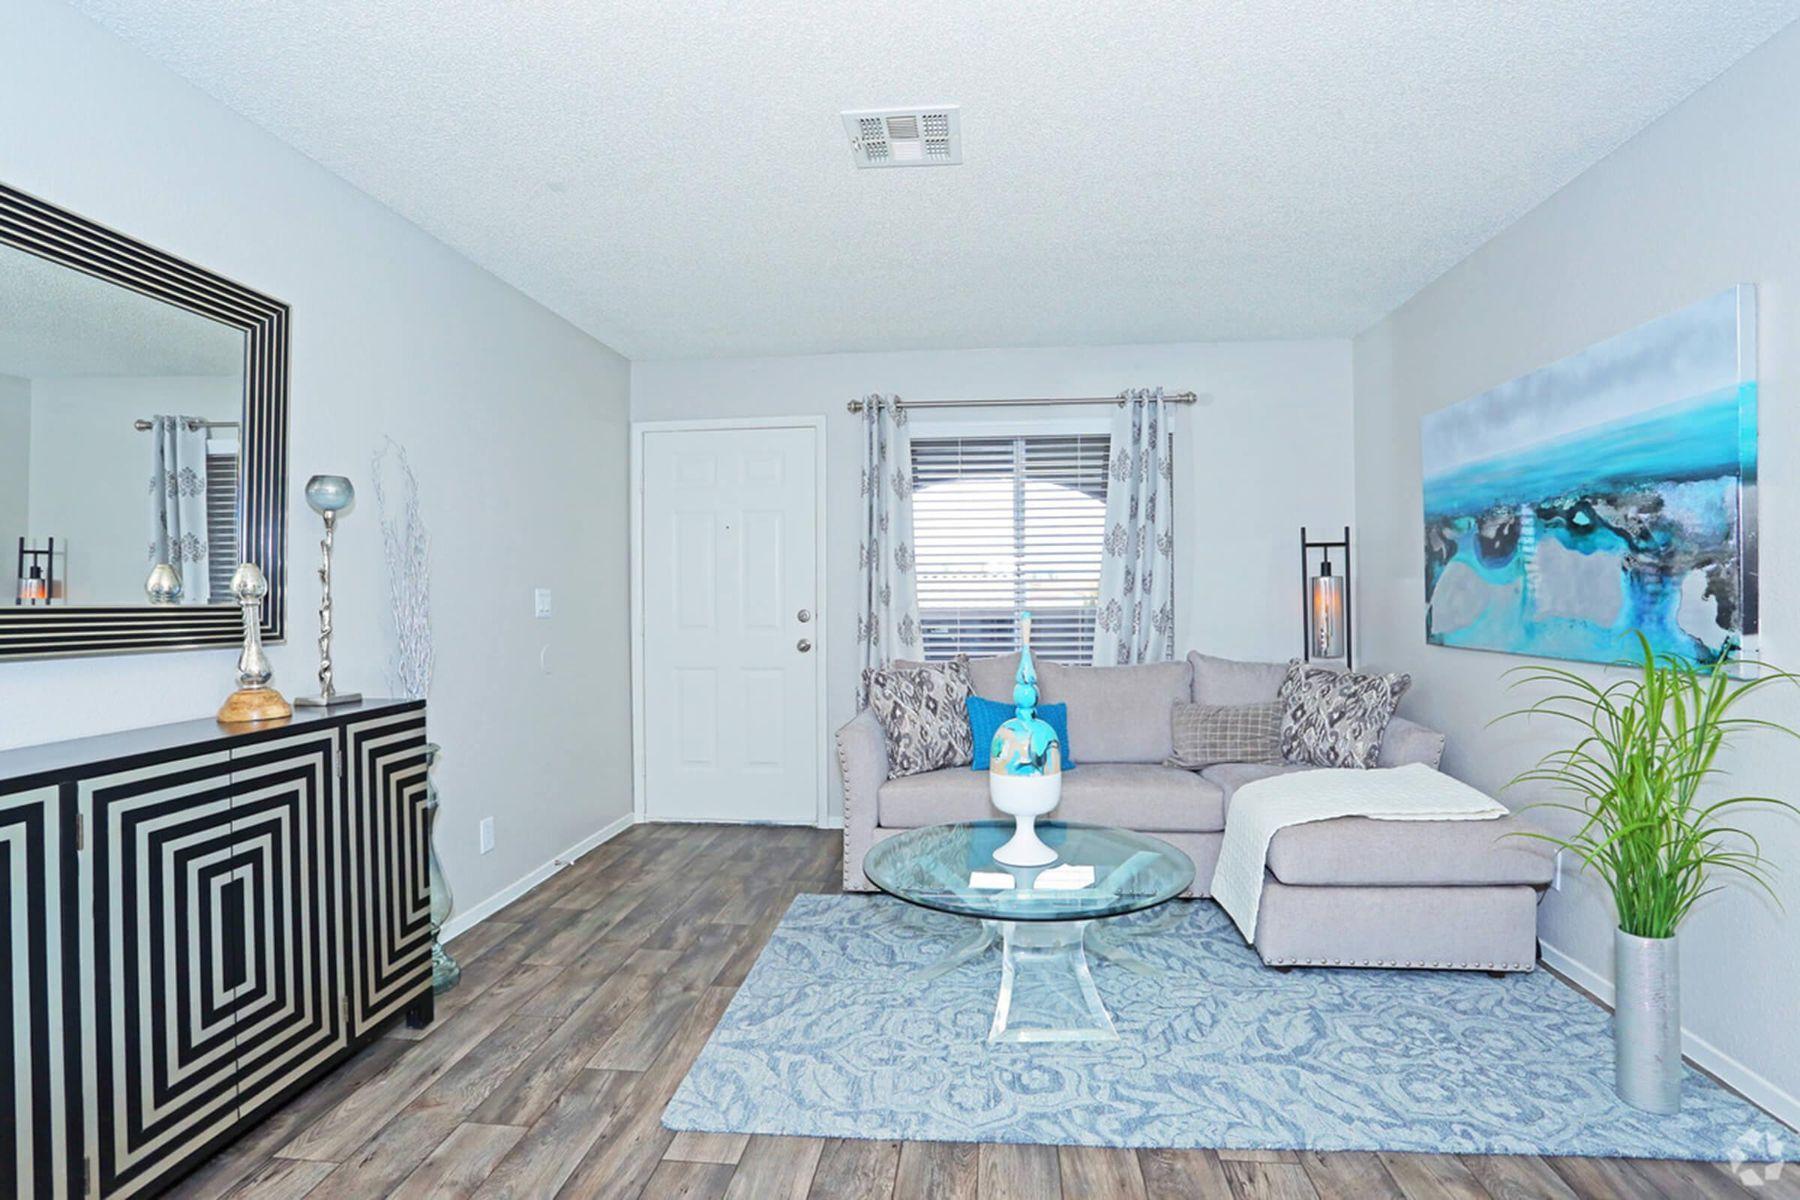 sunset-hills-apartments-henderson-nv-2br-2ba---960-sf-living-room.jpg